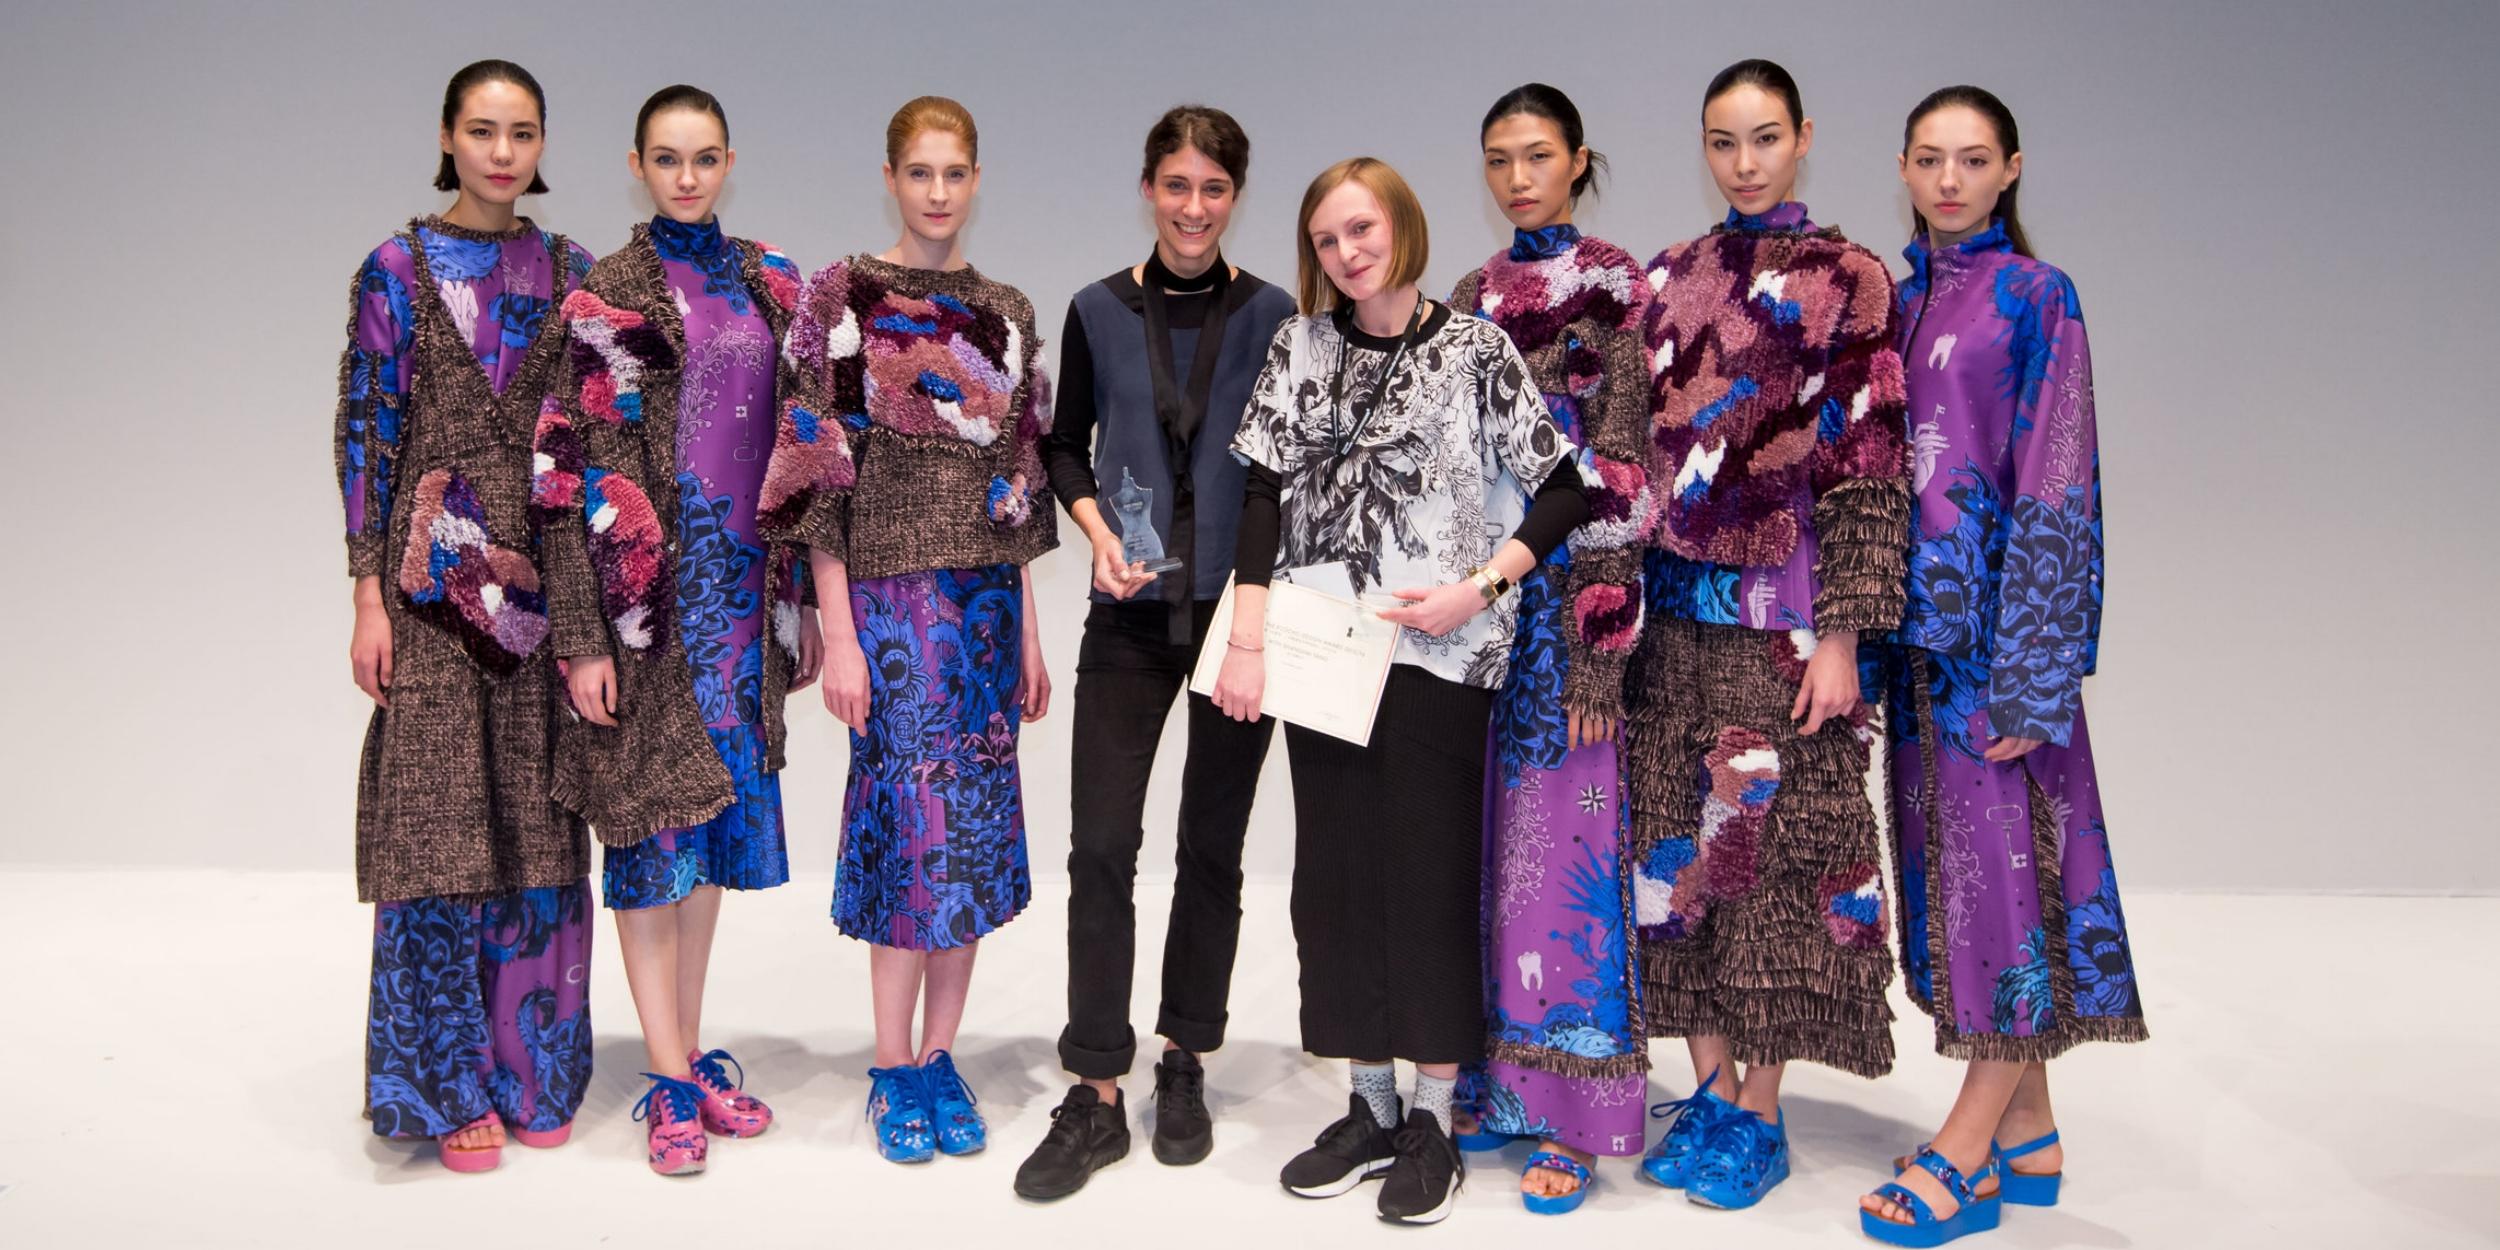 ECDA201516_1st Prize Winer_Patrycja Guzik and 2nd Prize Winner_Cora Maria Bellotto.jpg